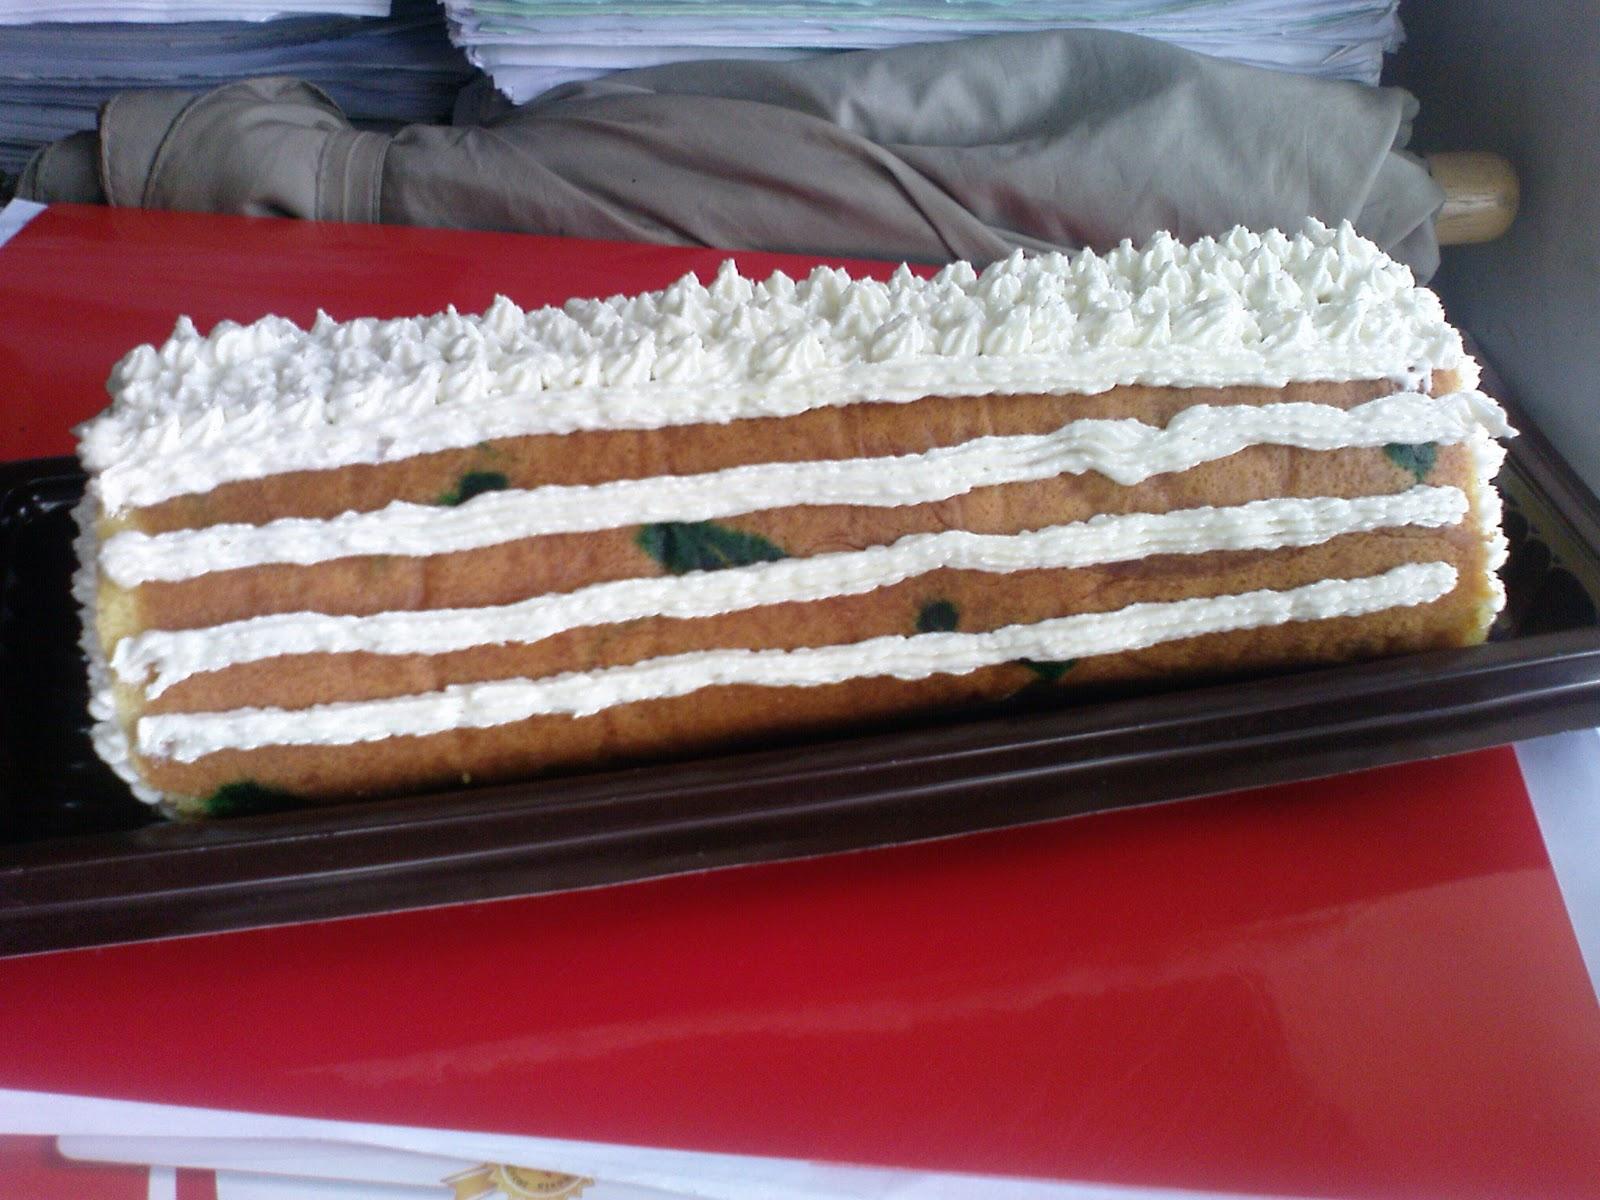 Wennys Cakes Cookies Bolu Gulung Selai Strawberry Untuk Caramel Cake Jg Hias Dikit Ah Biar Look Nicega Polos Plontos Cuma Sayanghasil Jepretan Kurang Ok